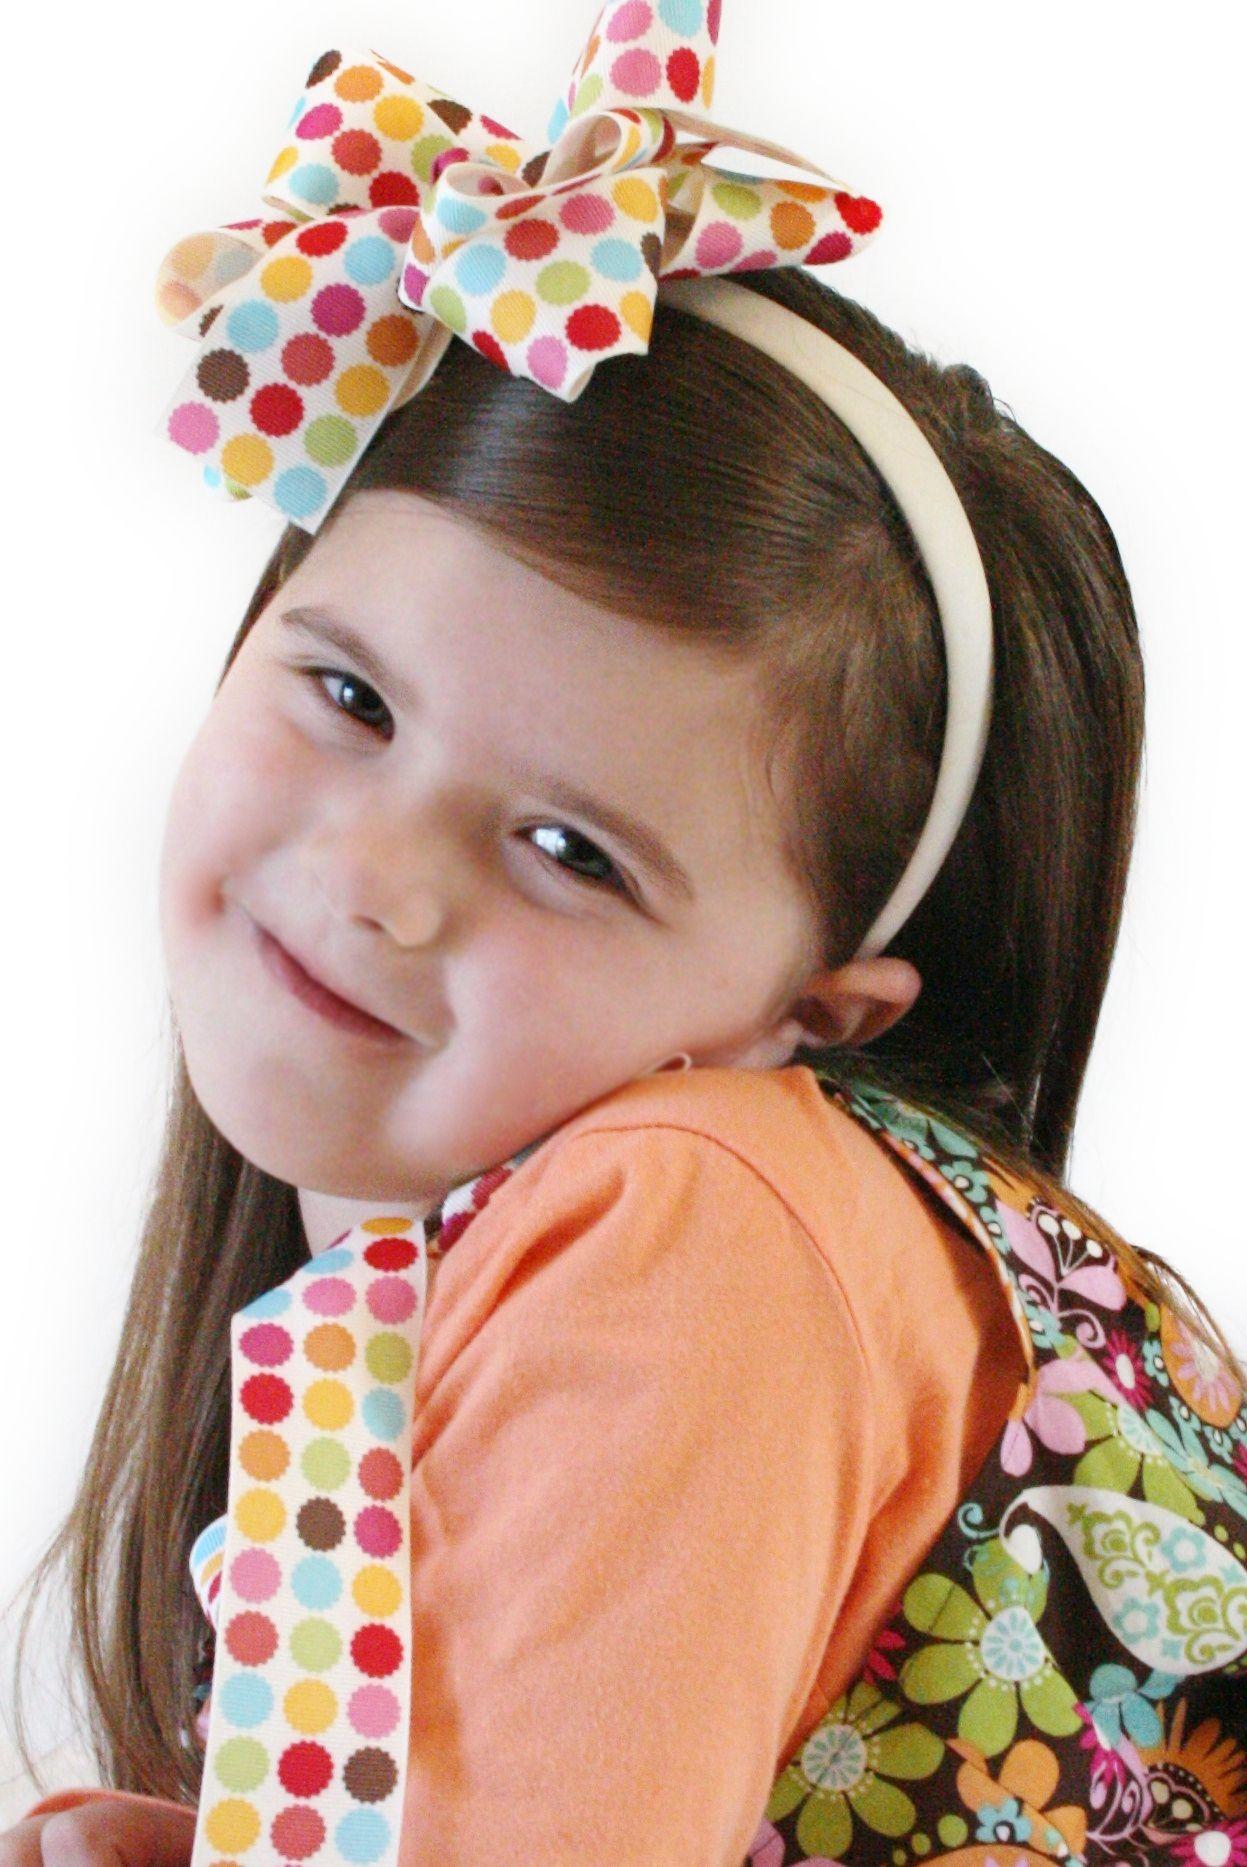 My granddaughter LaDessa Hope